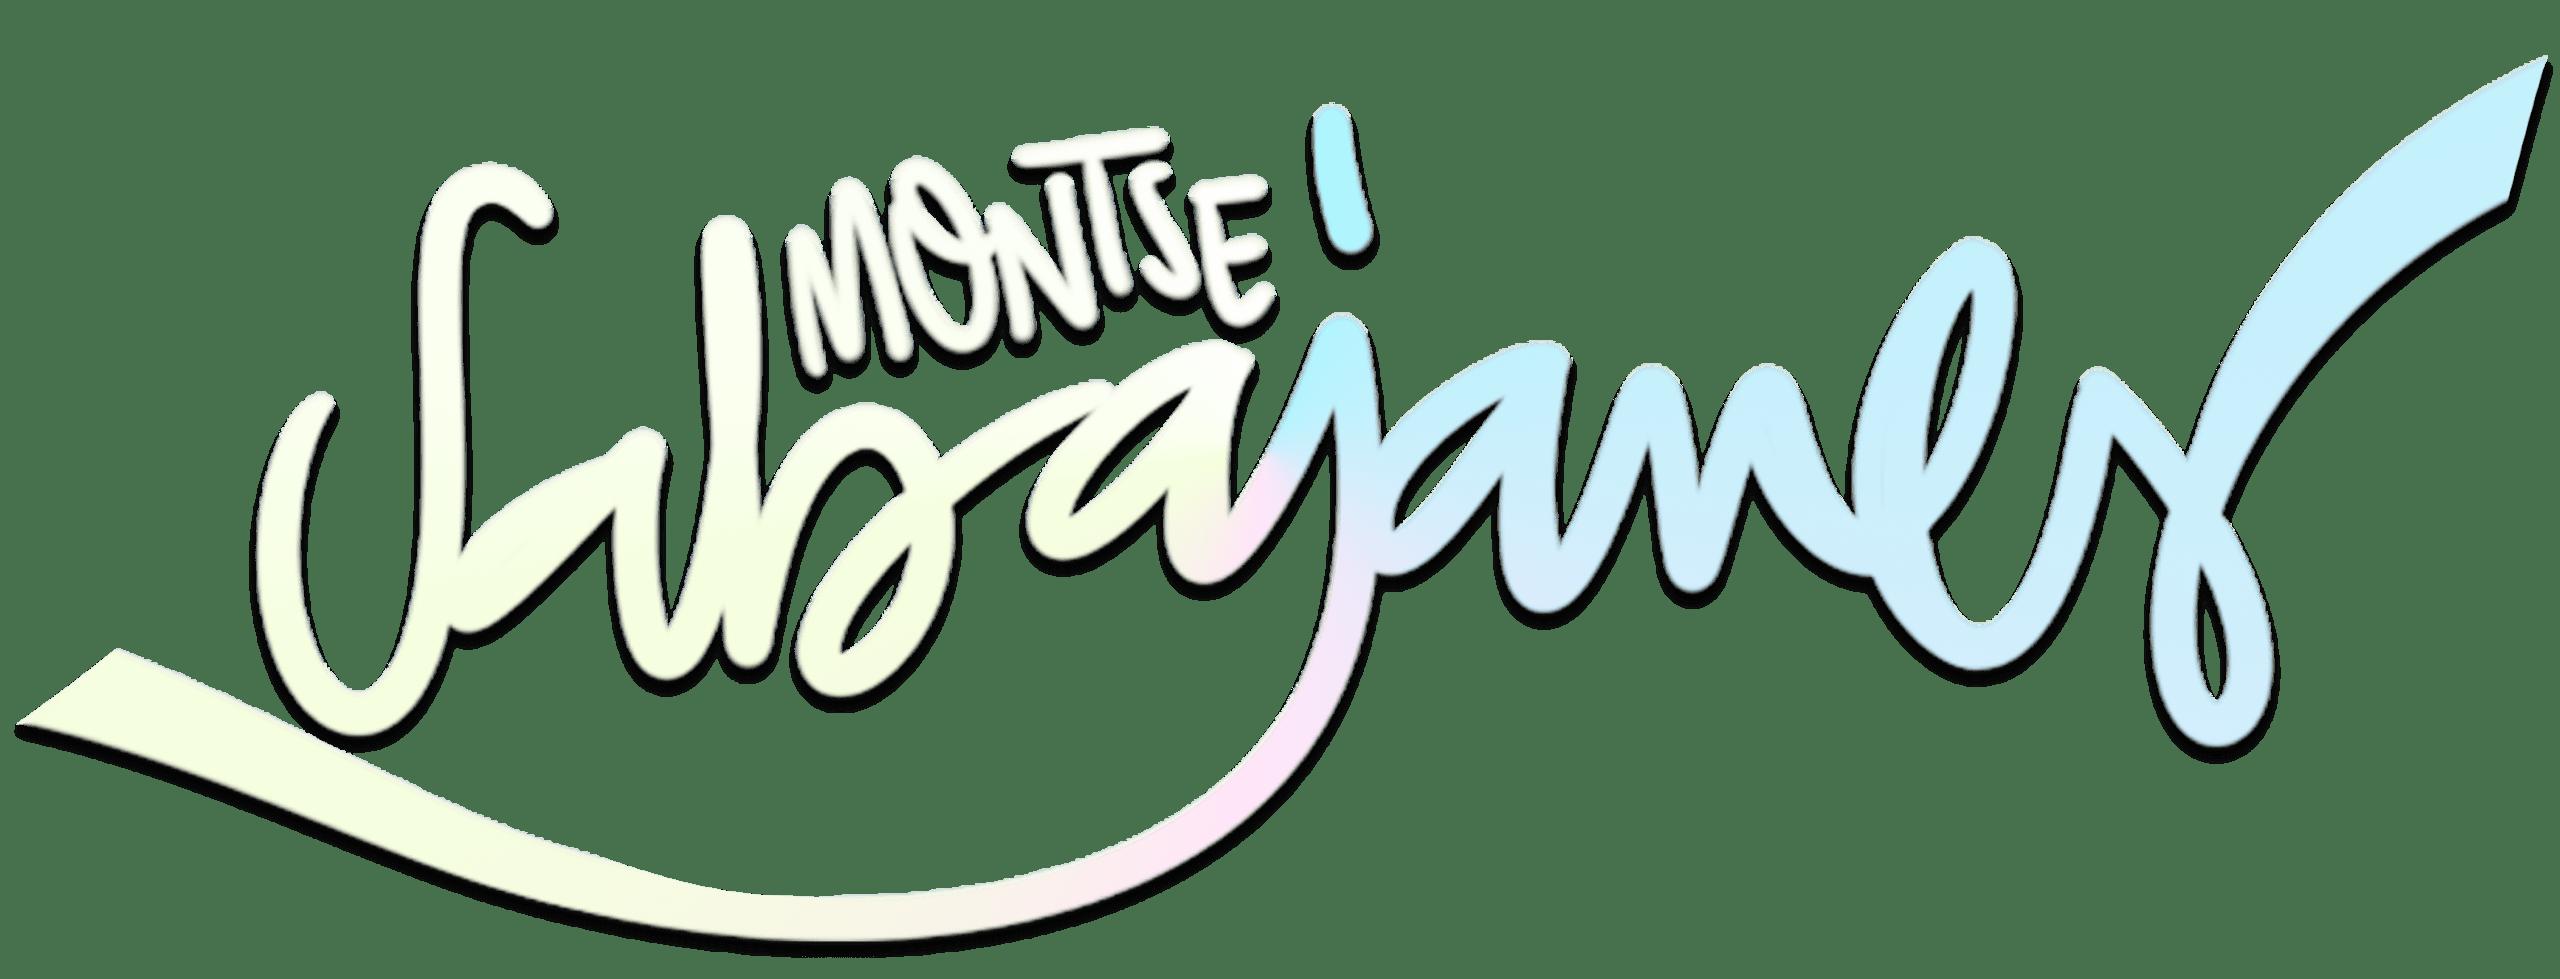 Montse Sabajanes